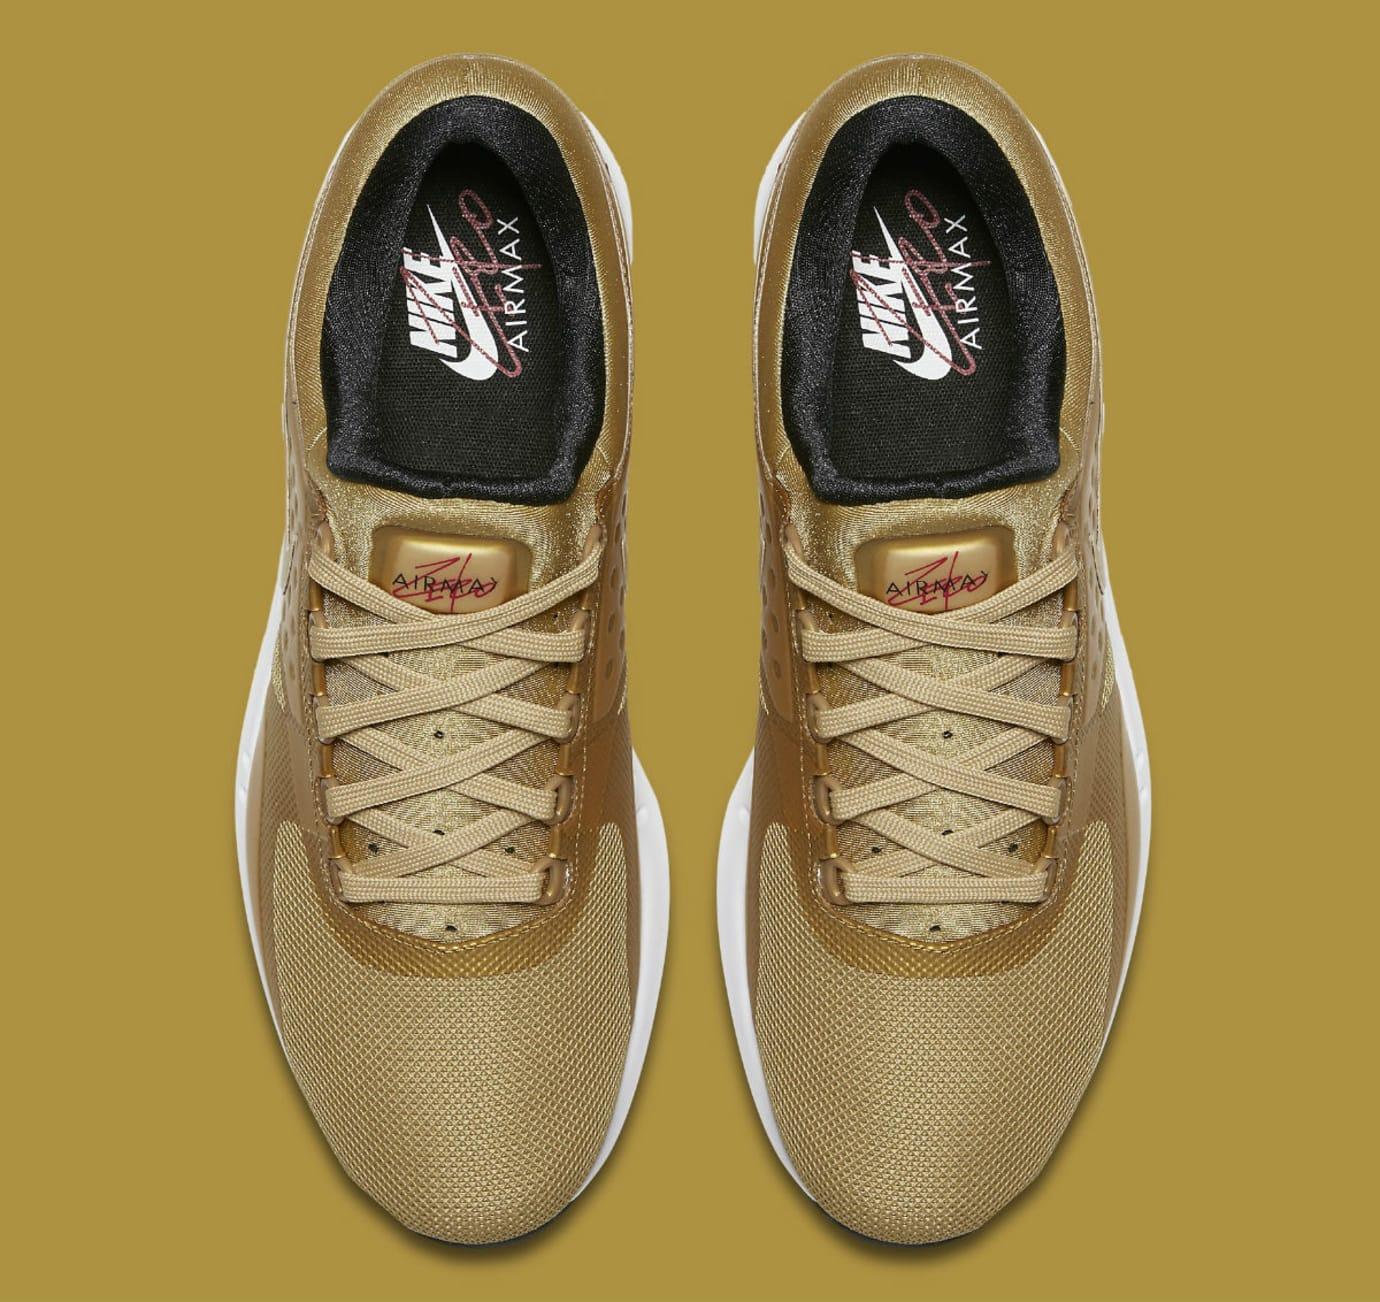 NIke Air Max Zero Metallic Gold Release Date 789695-700  c5f5516fb